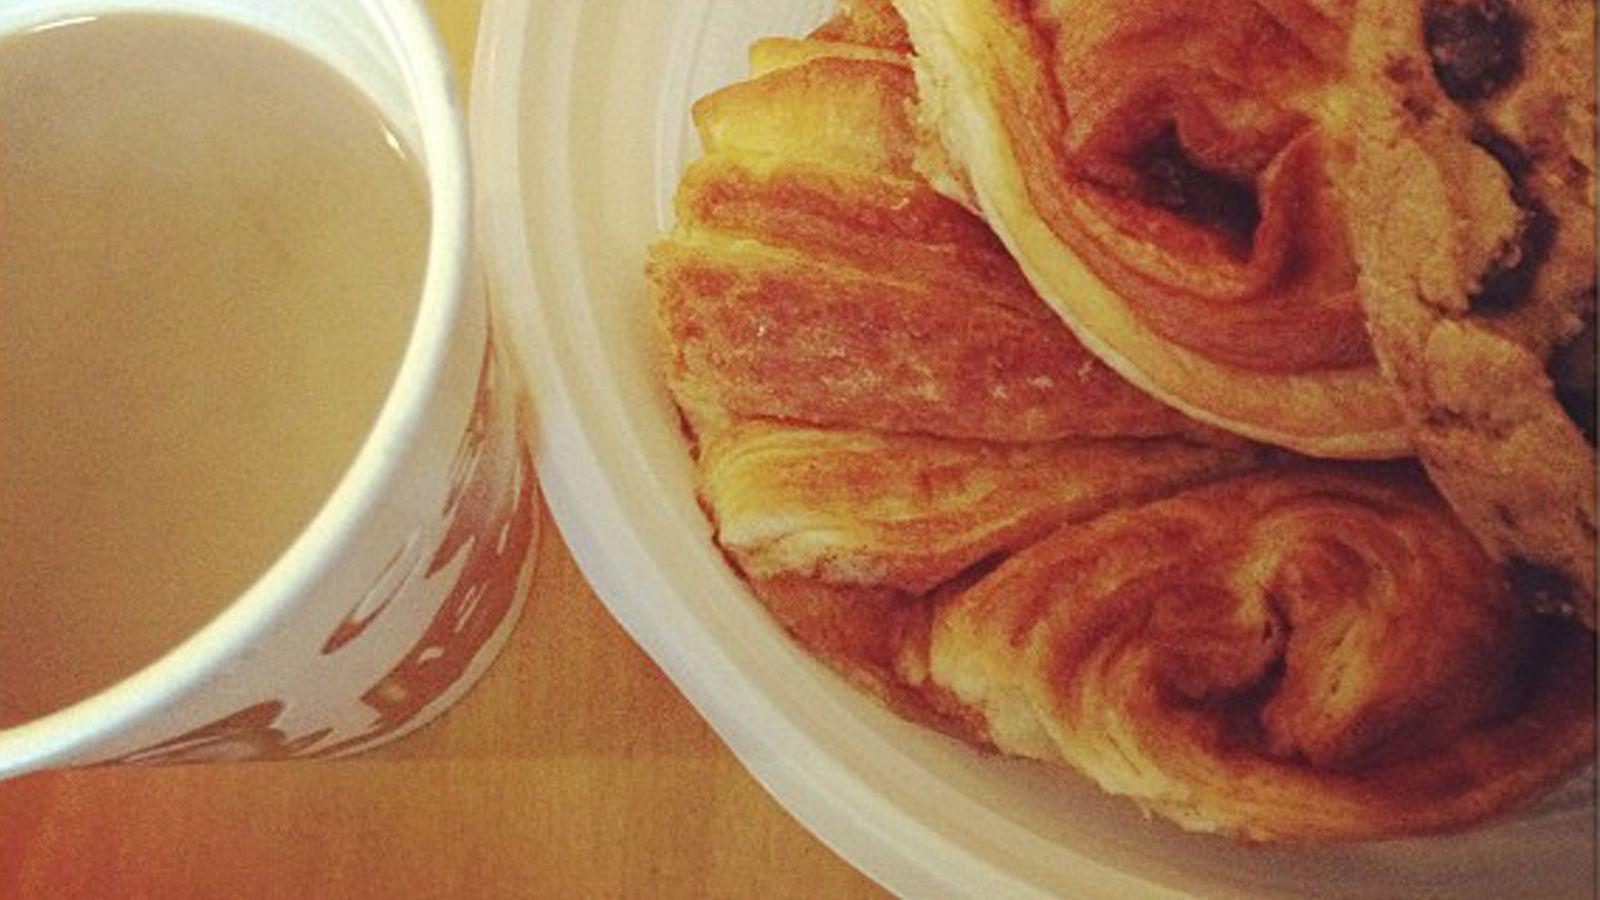 #goverbreak – Frühstücks-Meetup auf der #rp14